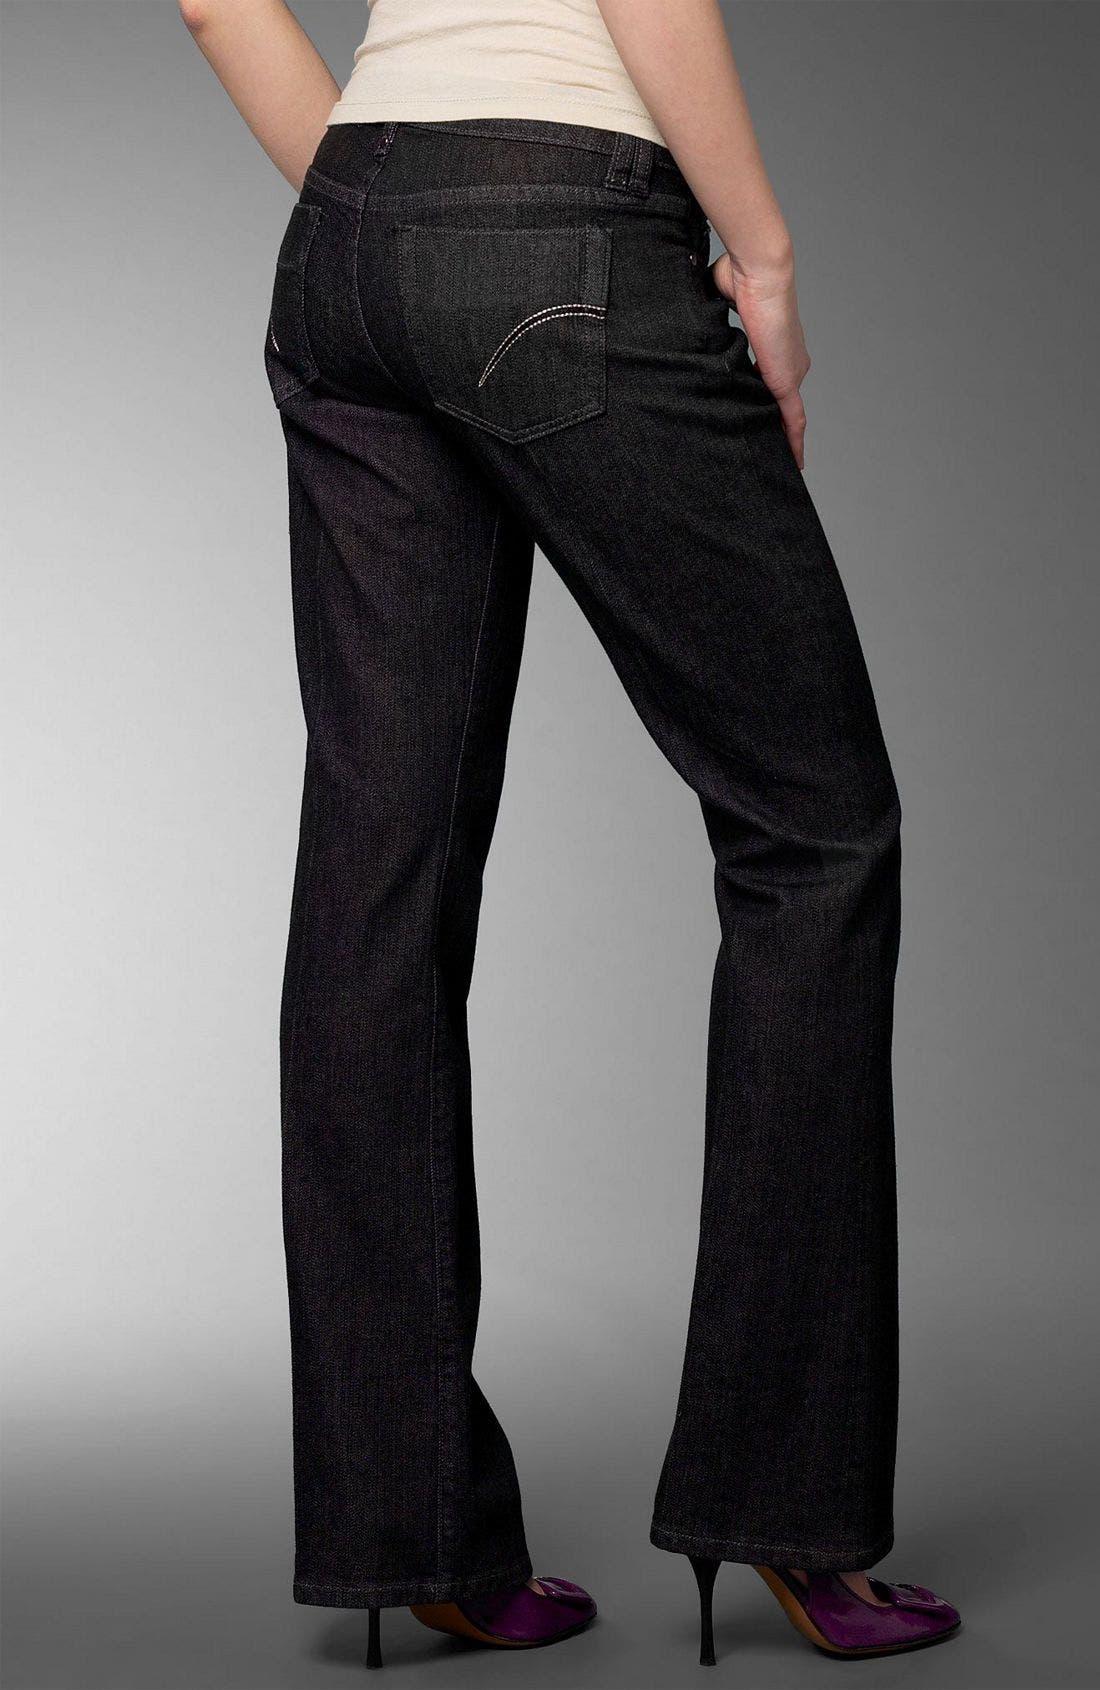 Alternate Image 1 Selected - Joe's Jeans 'Honey' Stretch Jeans (Berlin)